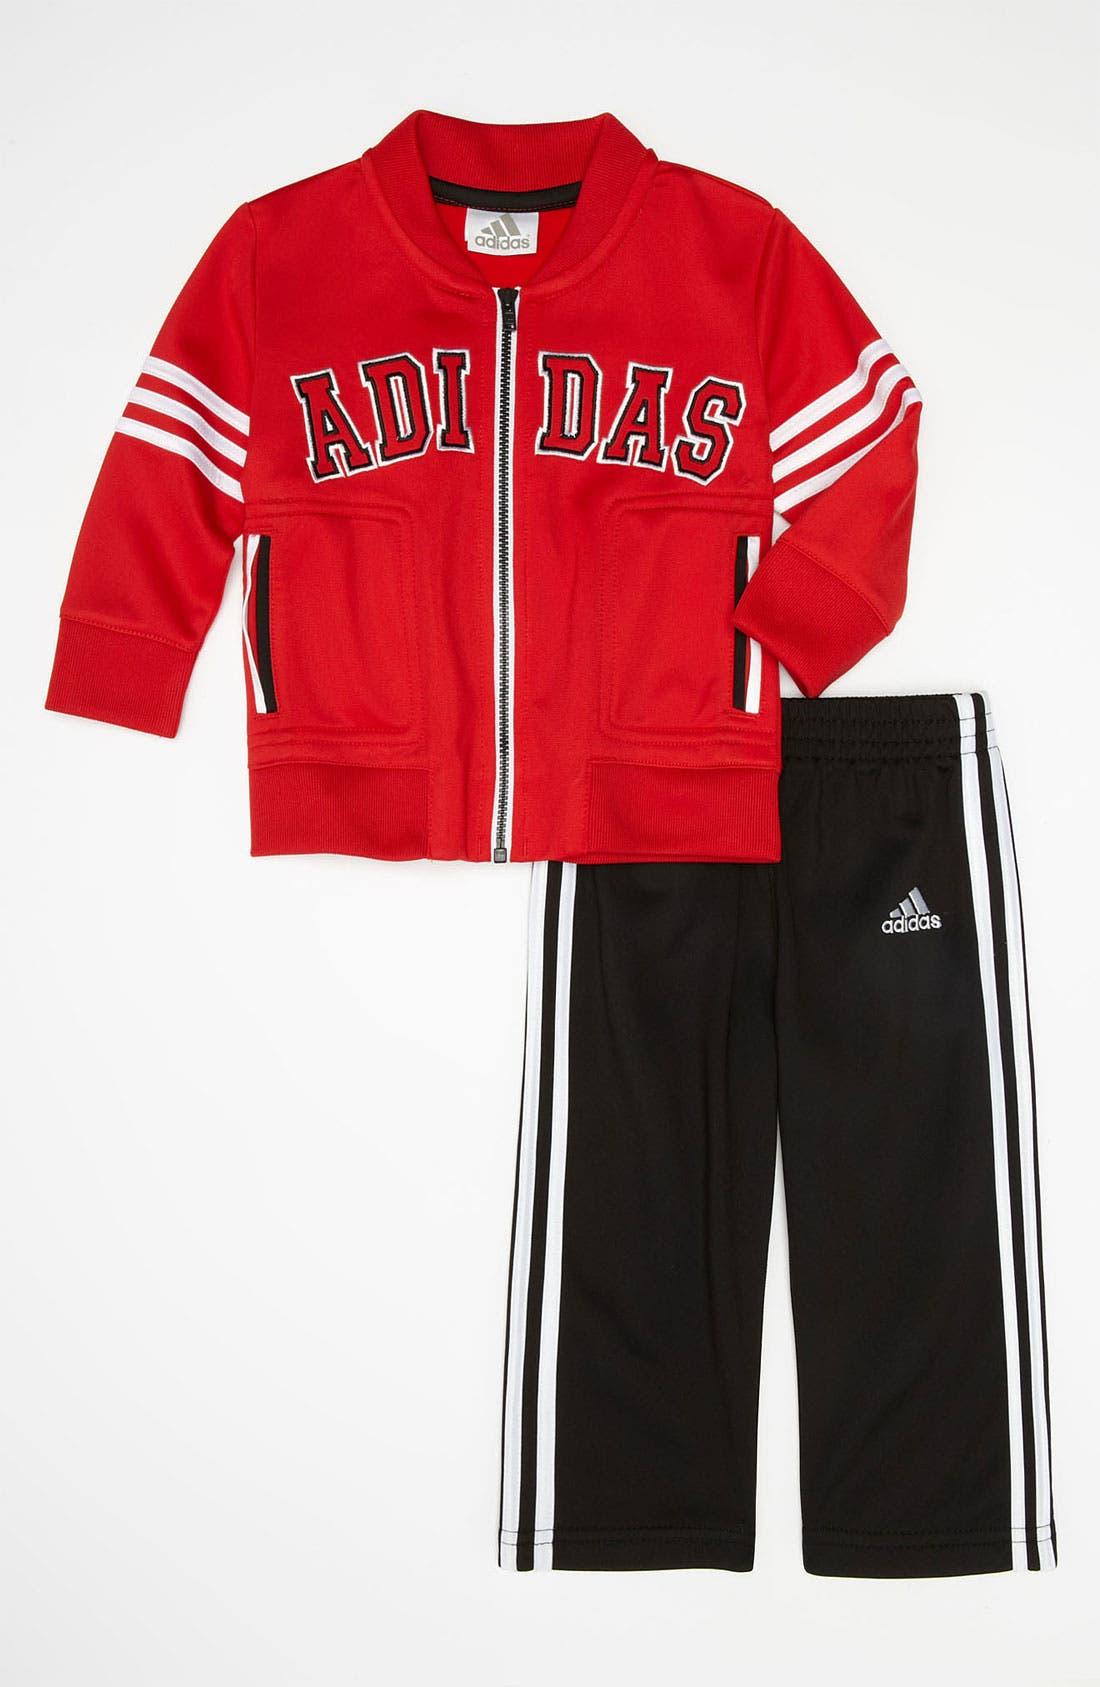 Alternate Image 1 Selected - adidas 'Team' Jacket & Pants (Toddler)